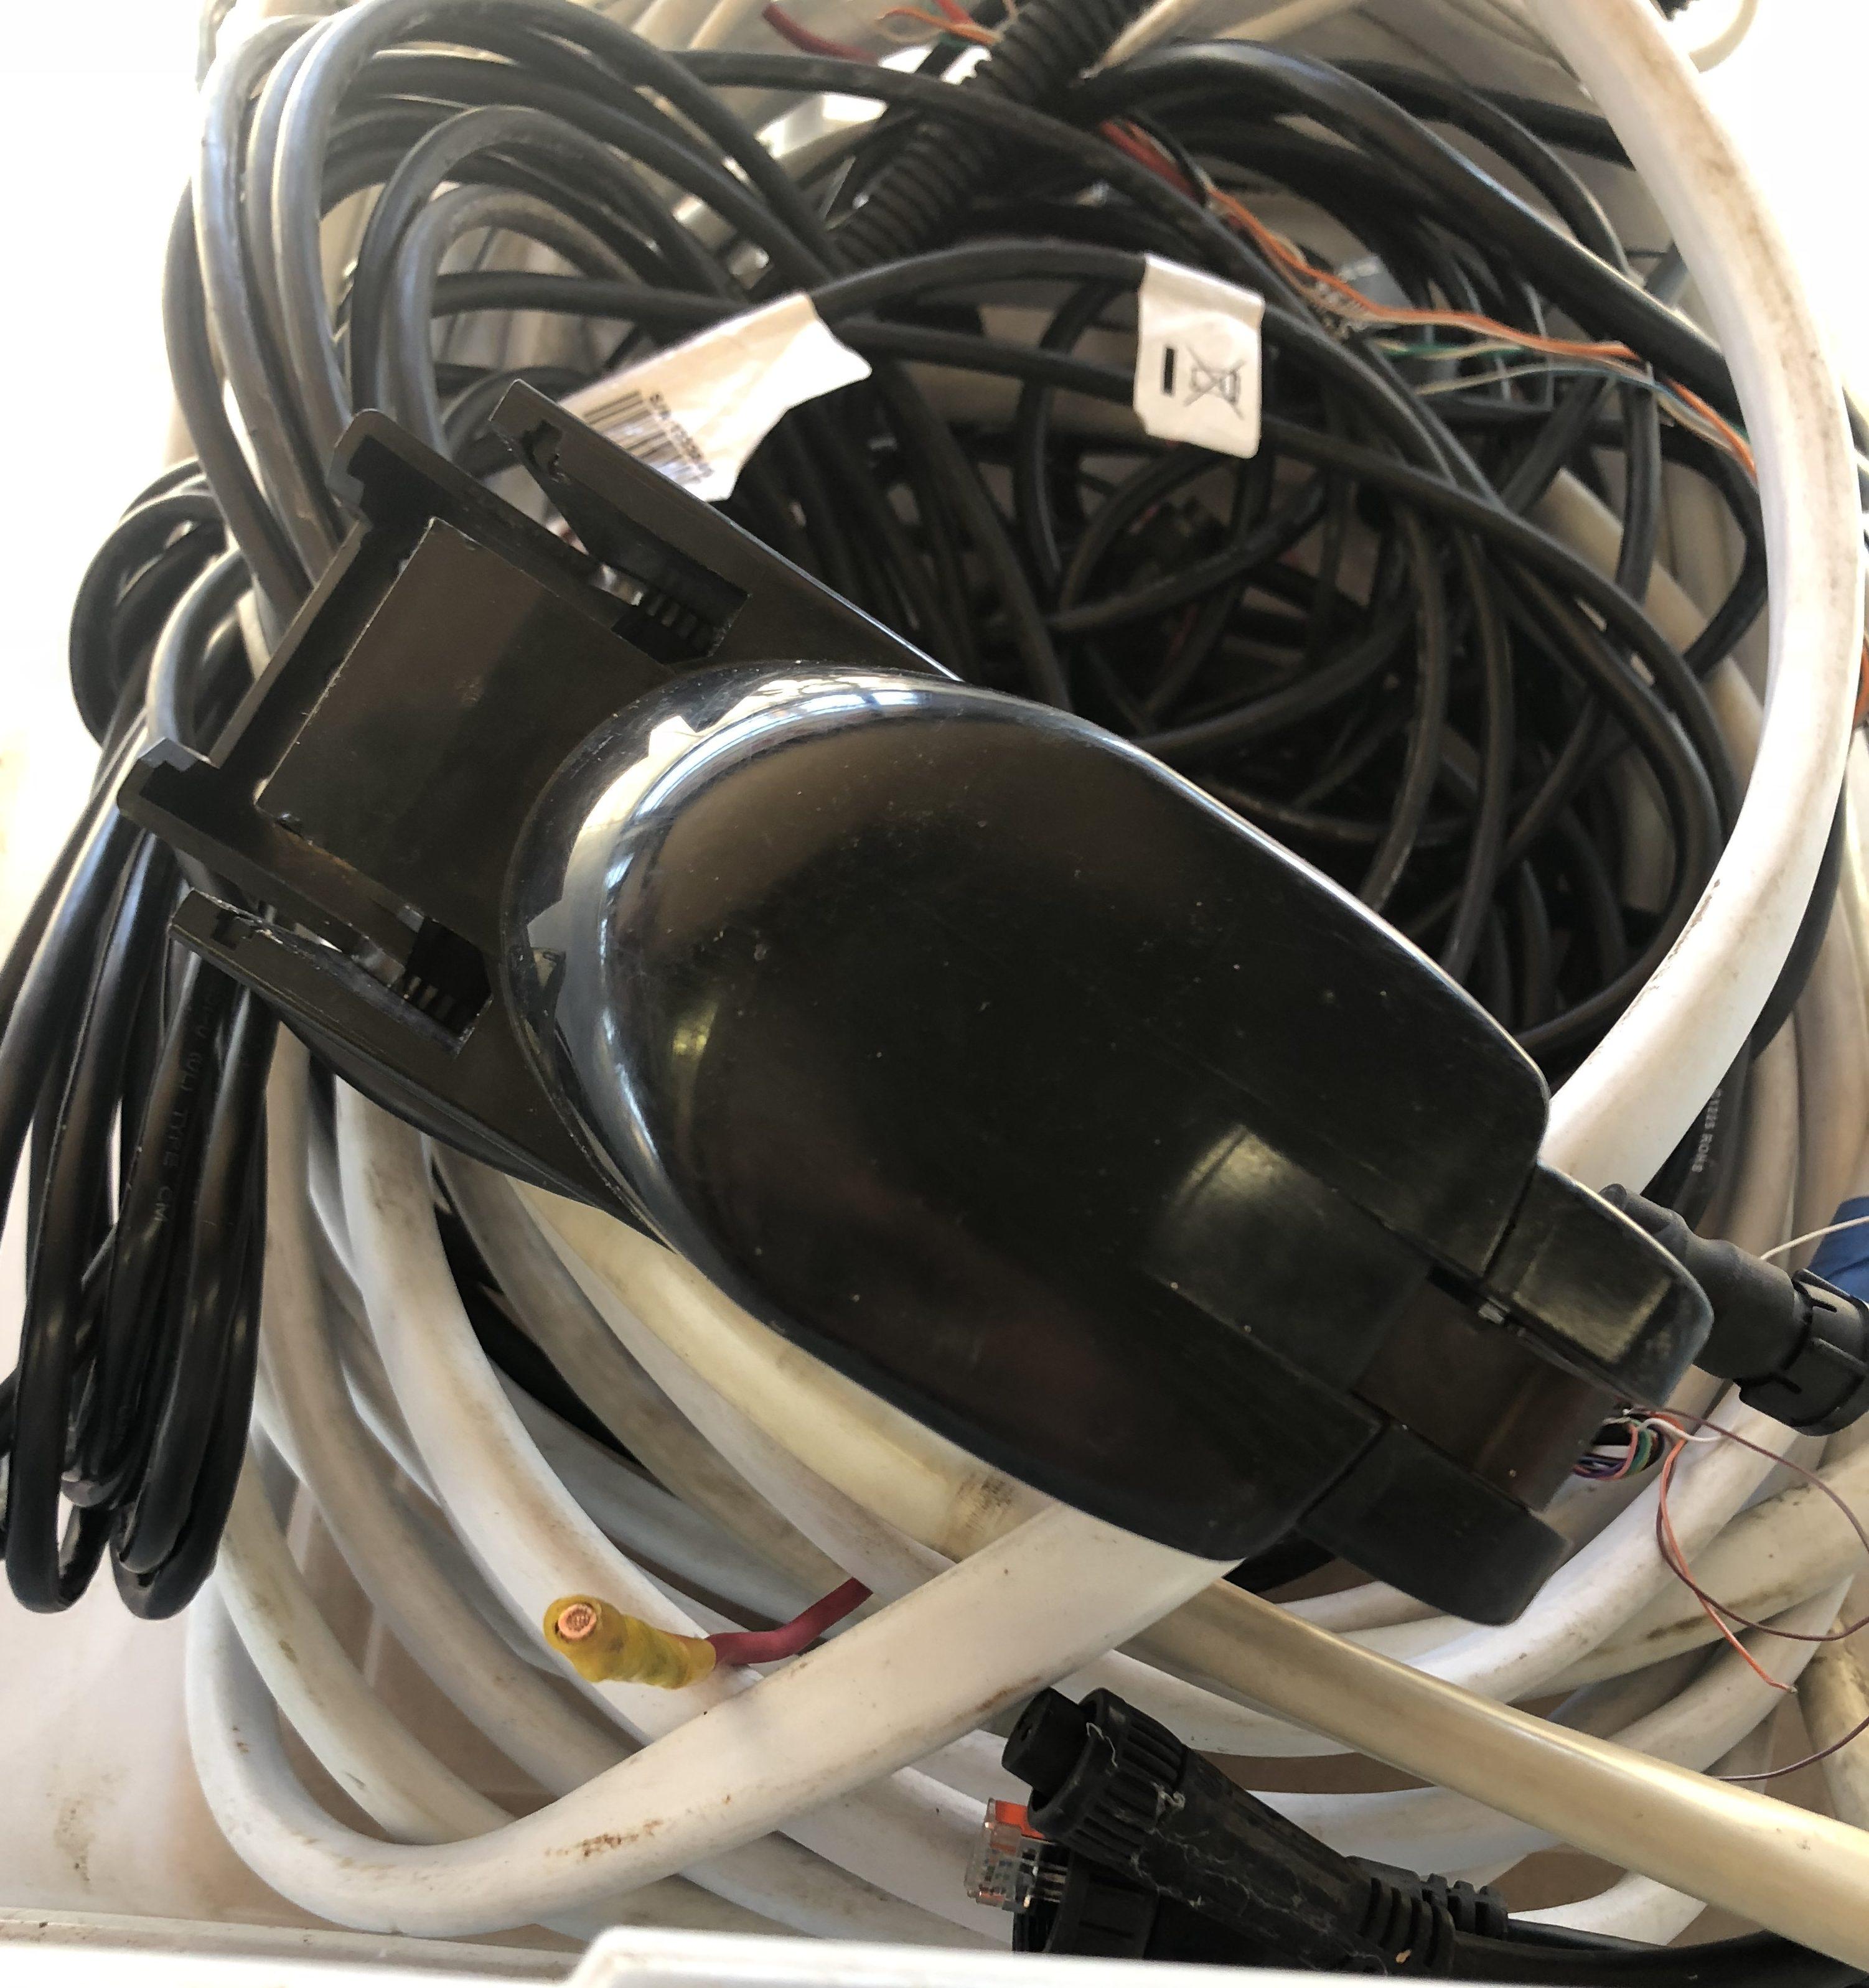 Garmin Gps 18 Pc Wiring Diagram Electrical Schematics Fishfinder Gpsmap 4212 Gmr Radome Gsd 22 Digital Calamp